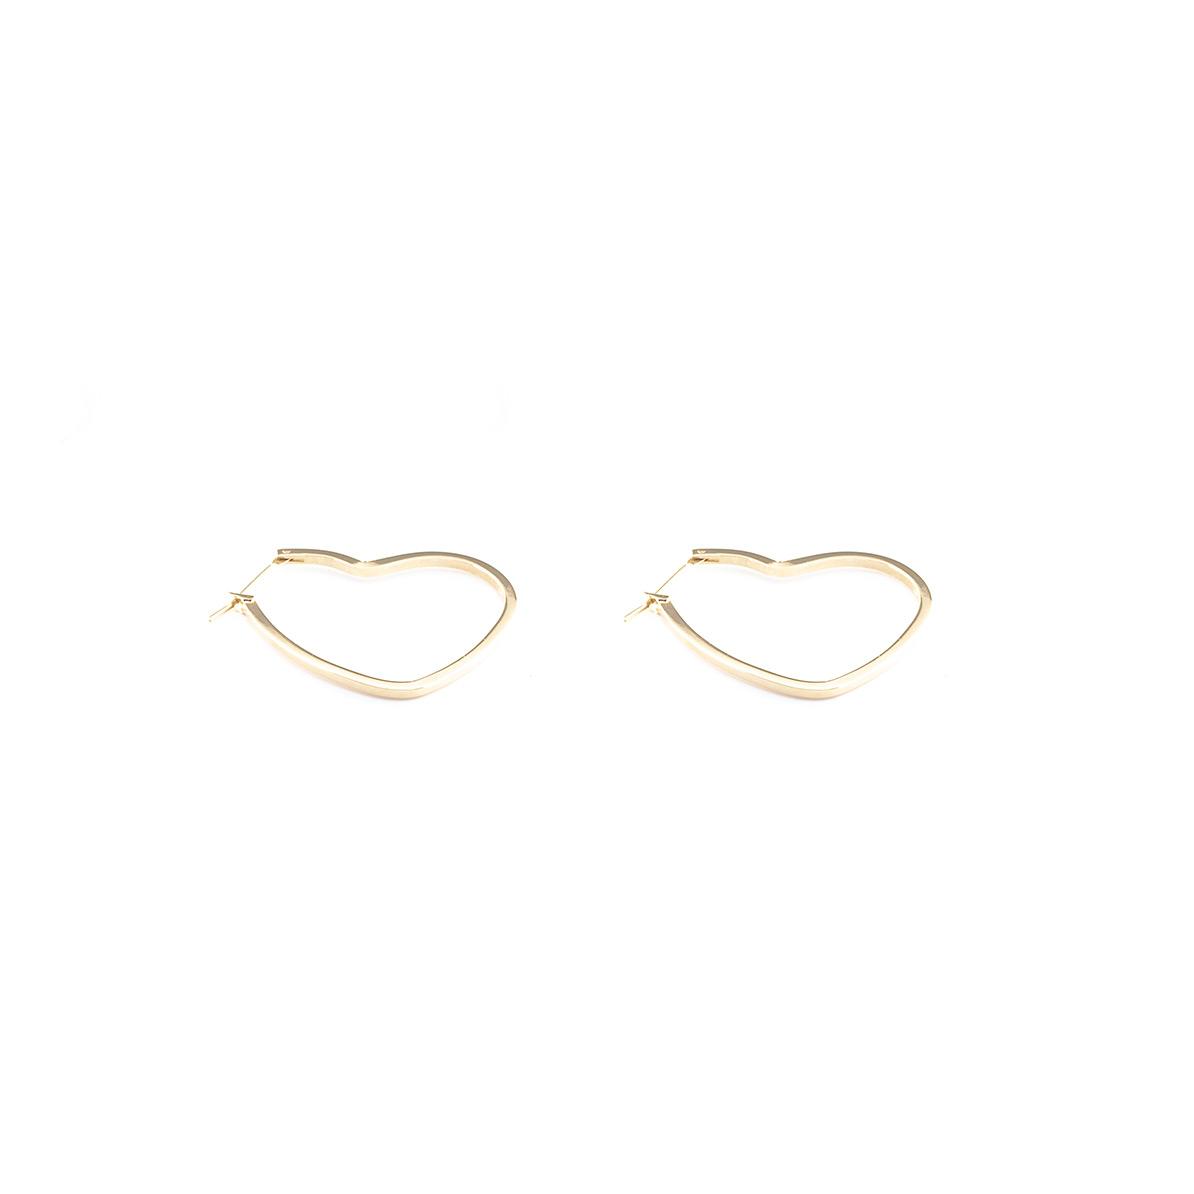 Ohrringe Herz klein vergoldet